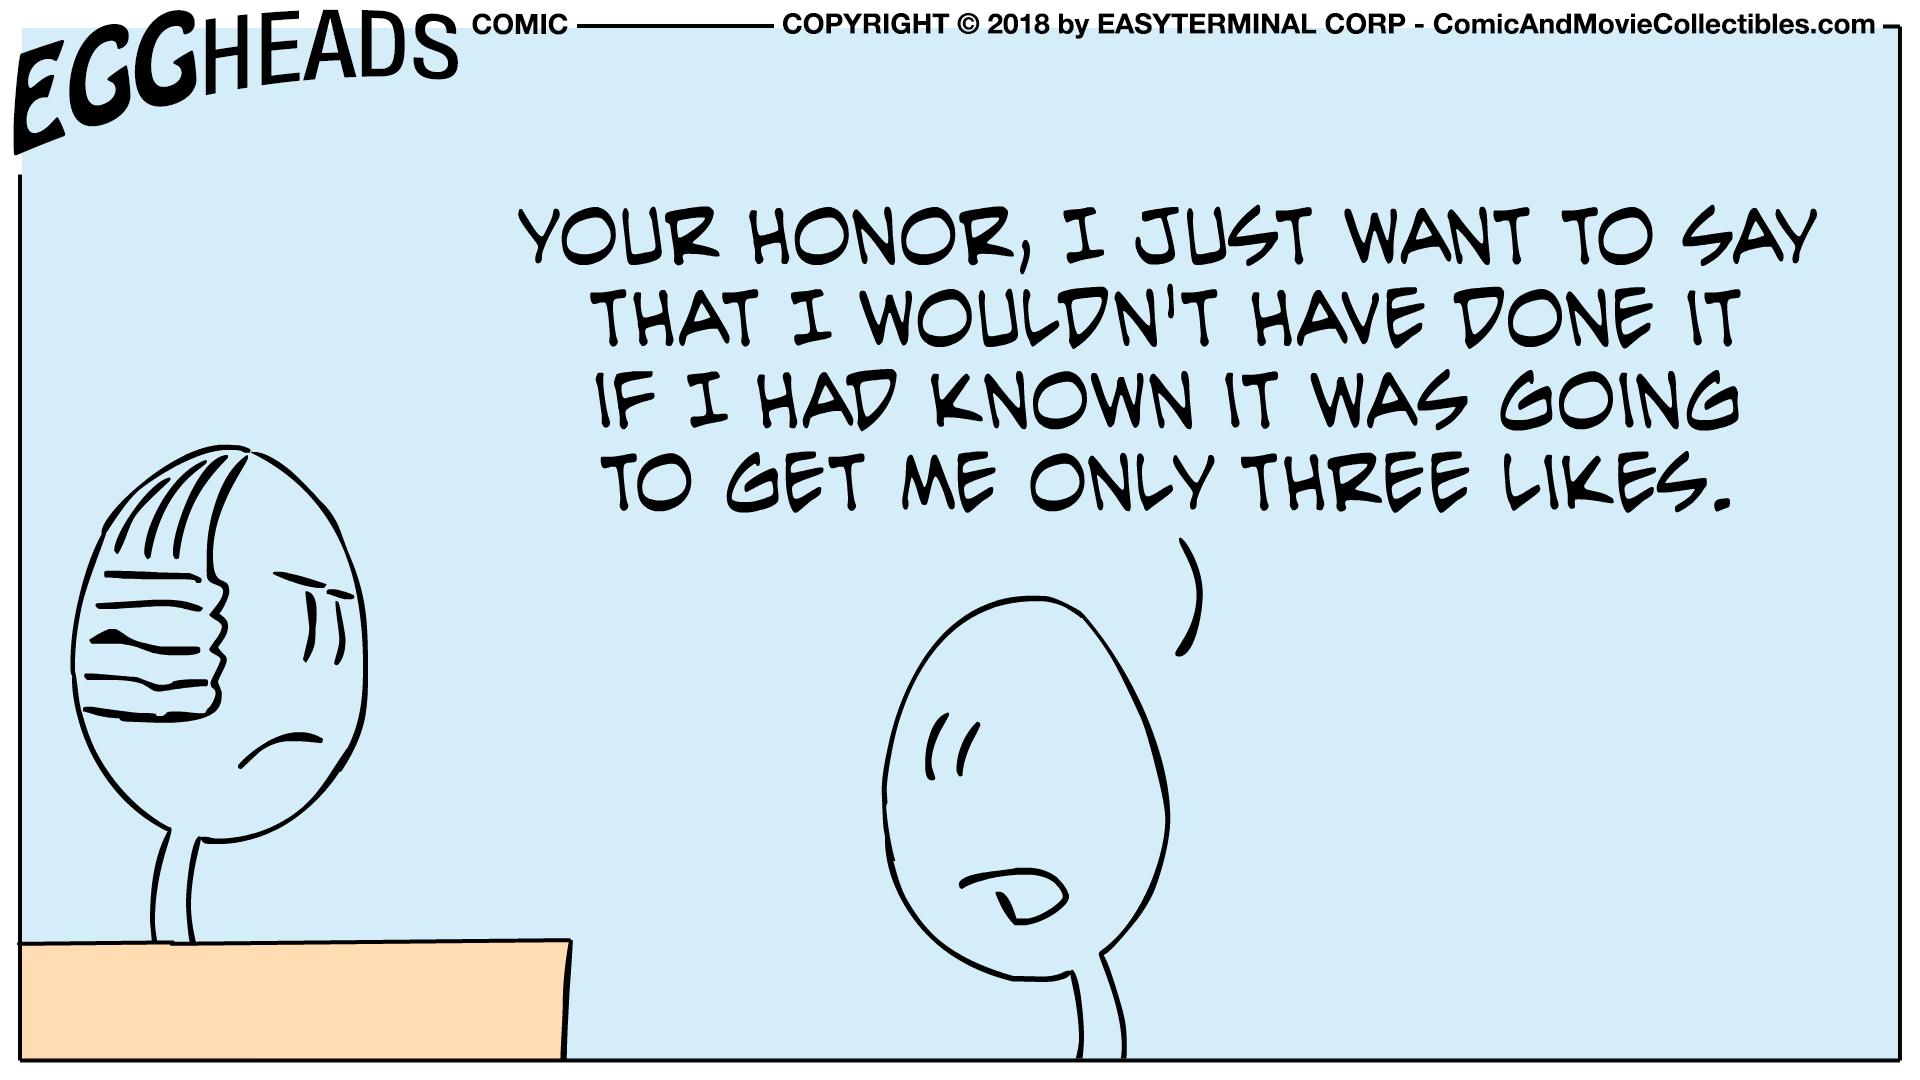 Webcomic Eggheads Comic Strip 010 Your Honor